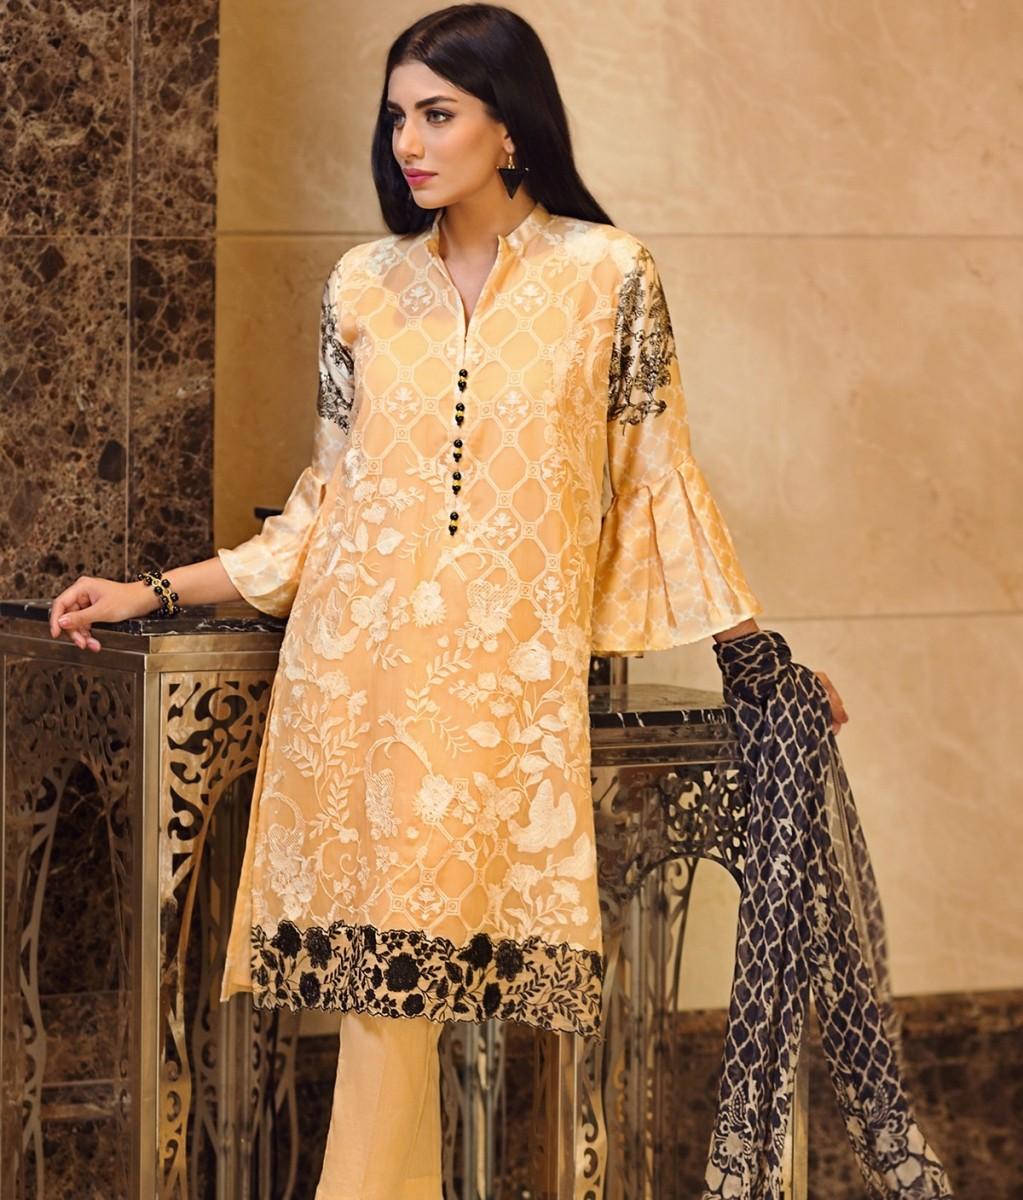 Embroidered formal chiffon Eid dress by Khaadi